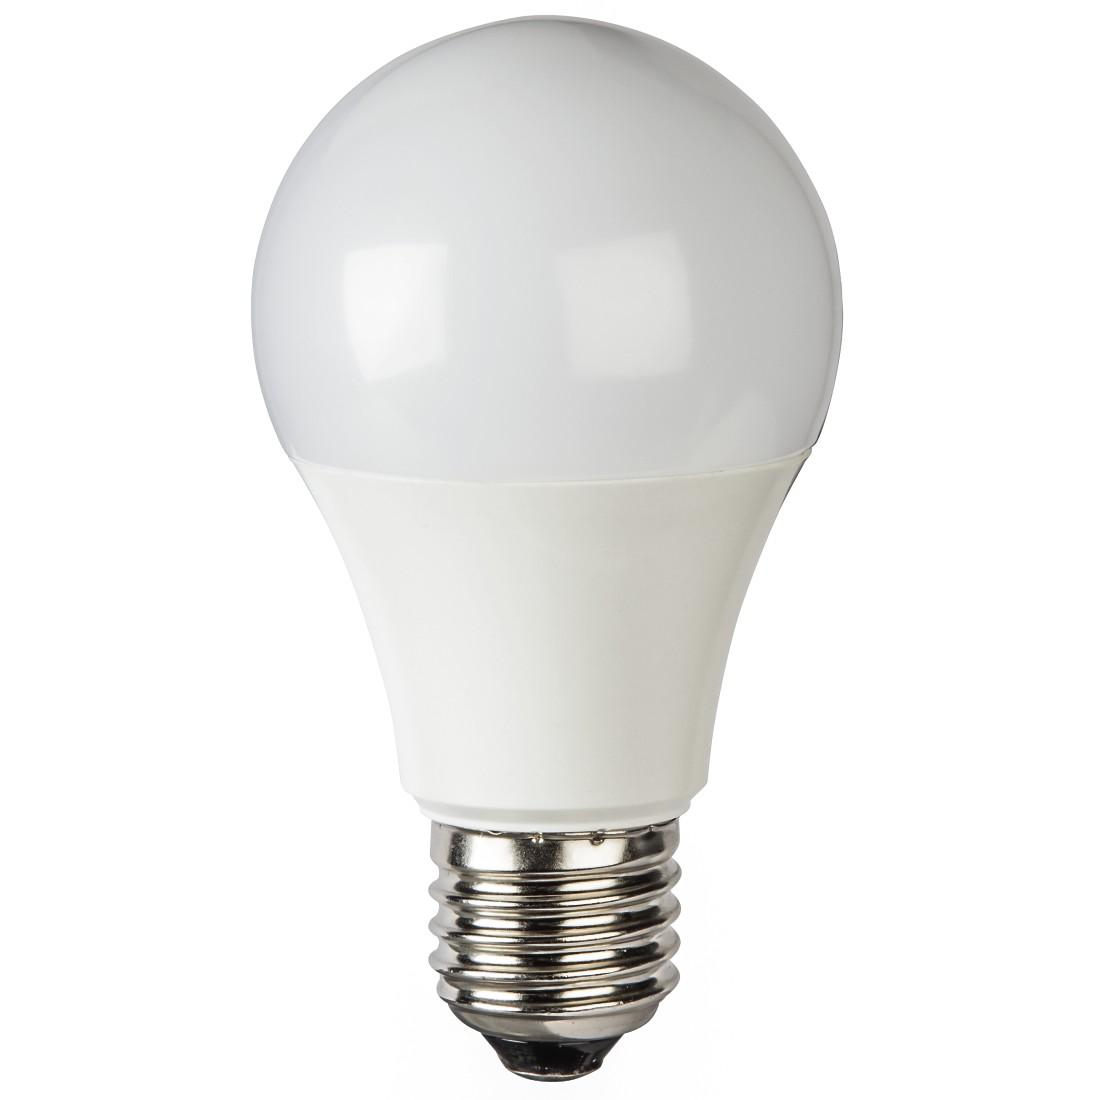 Xavax 00111974 xavax led lampe 8w glhlampenform e27 abx druckfhige abbildung xavax led lampe 8w glhlampenform e27 parisarafo Choice Image